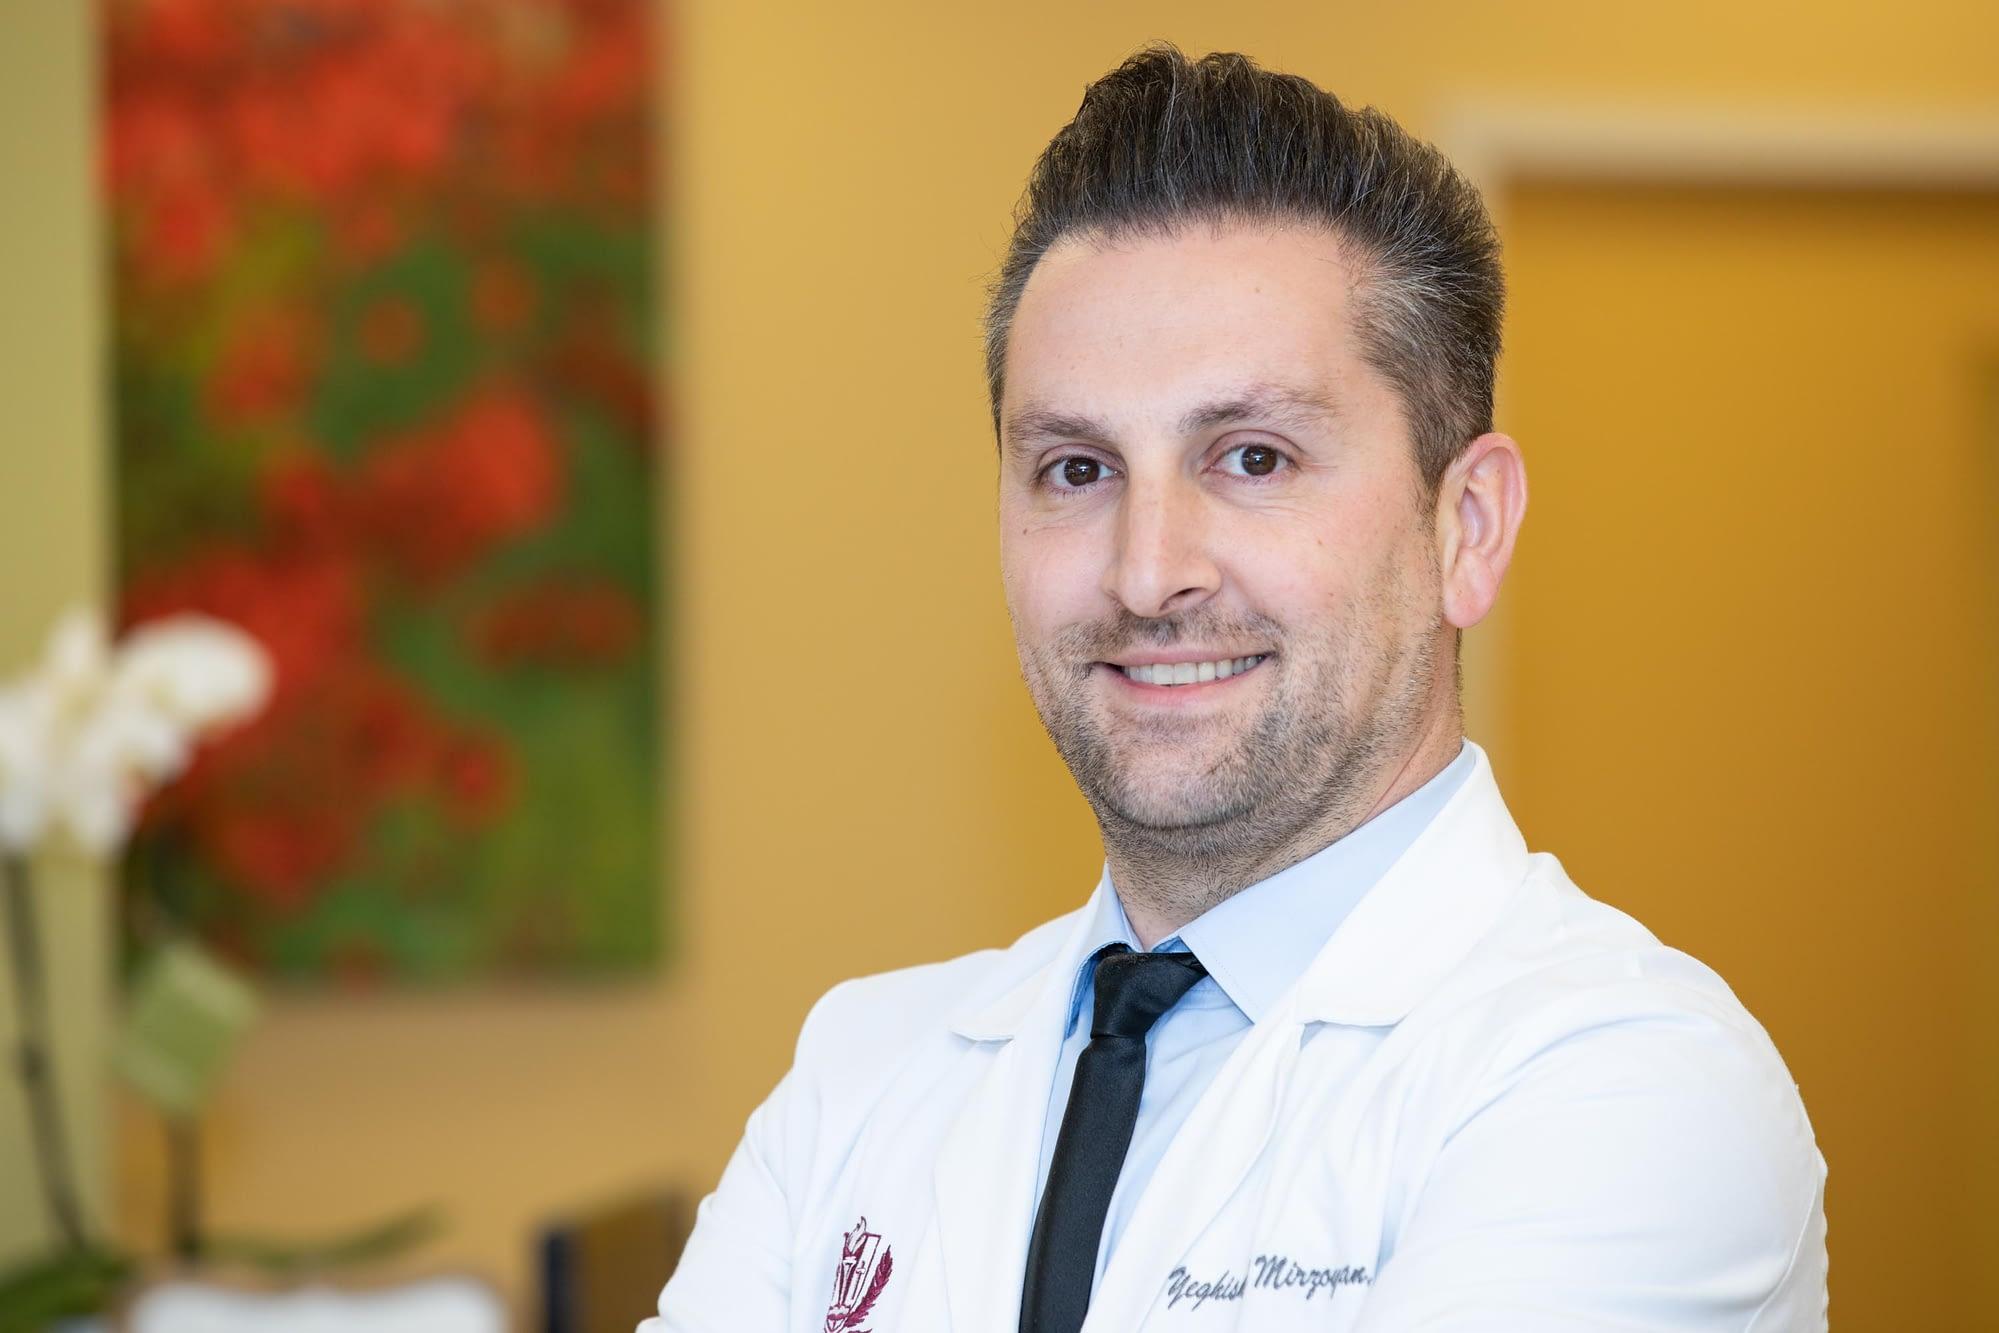 Dr Mirzoyan talks about sedation Van Nuys, CA